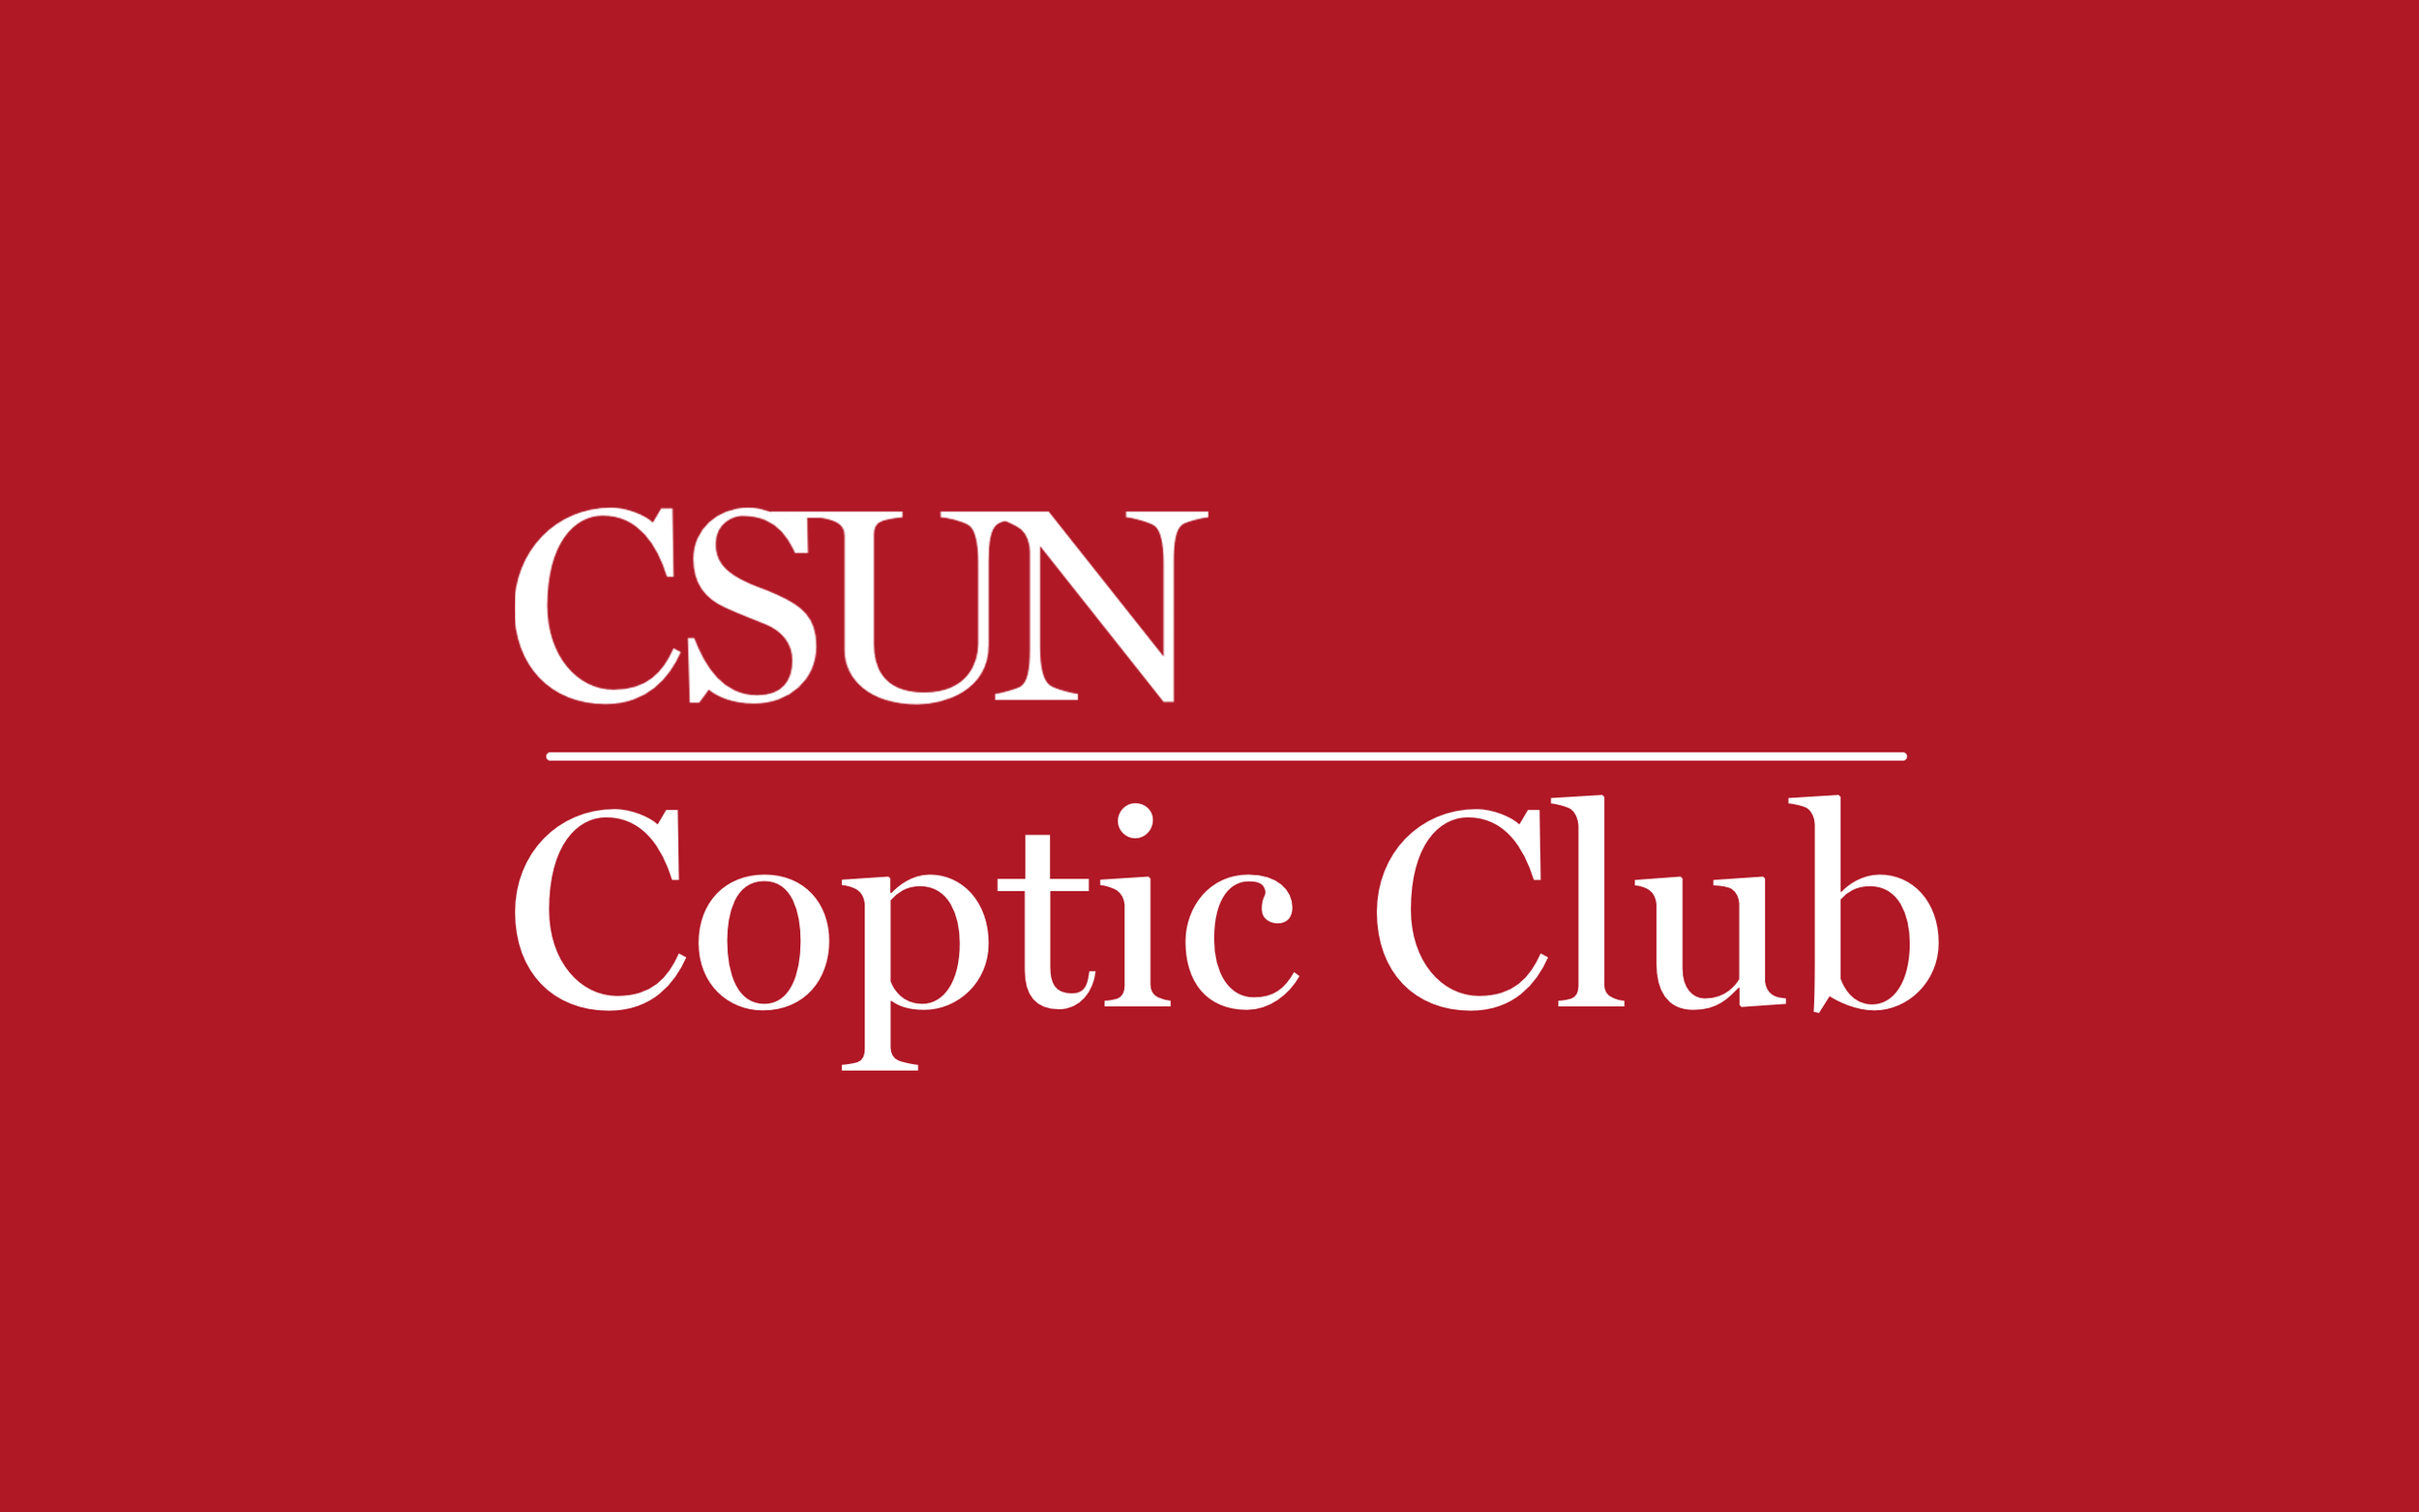 CSUN Coptic Club.png